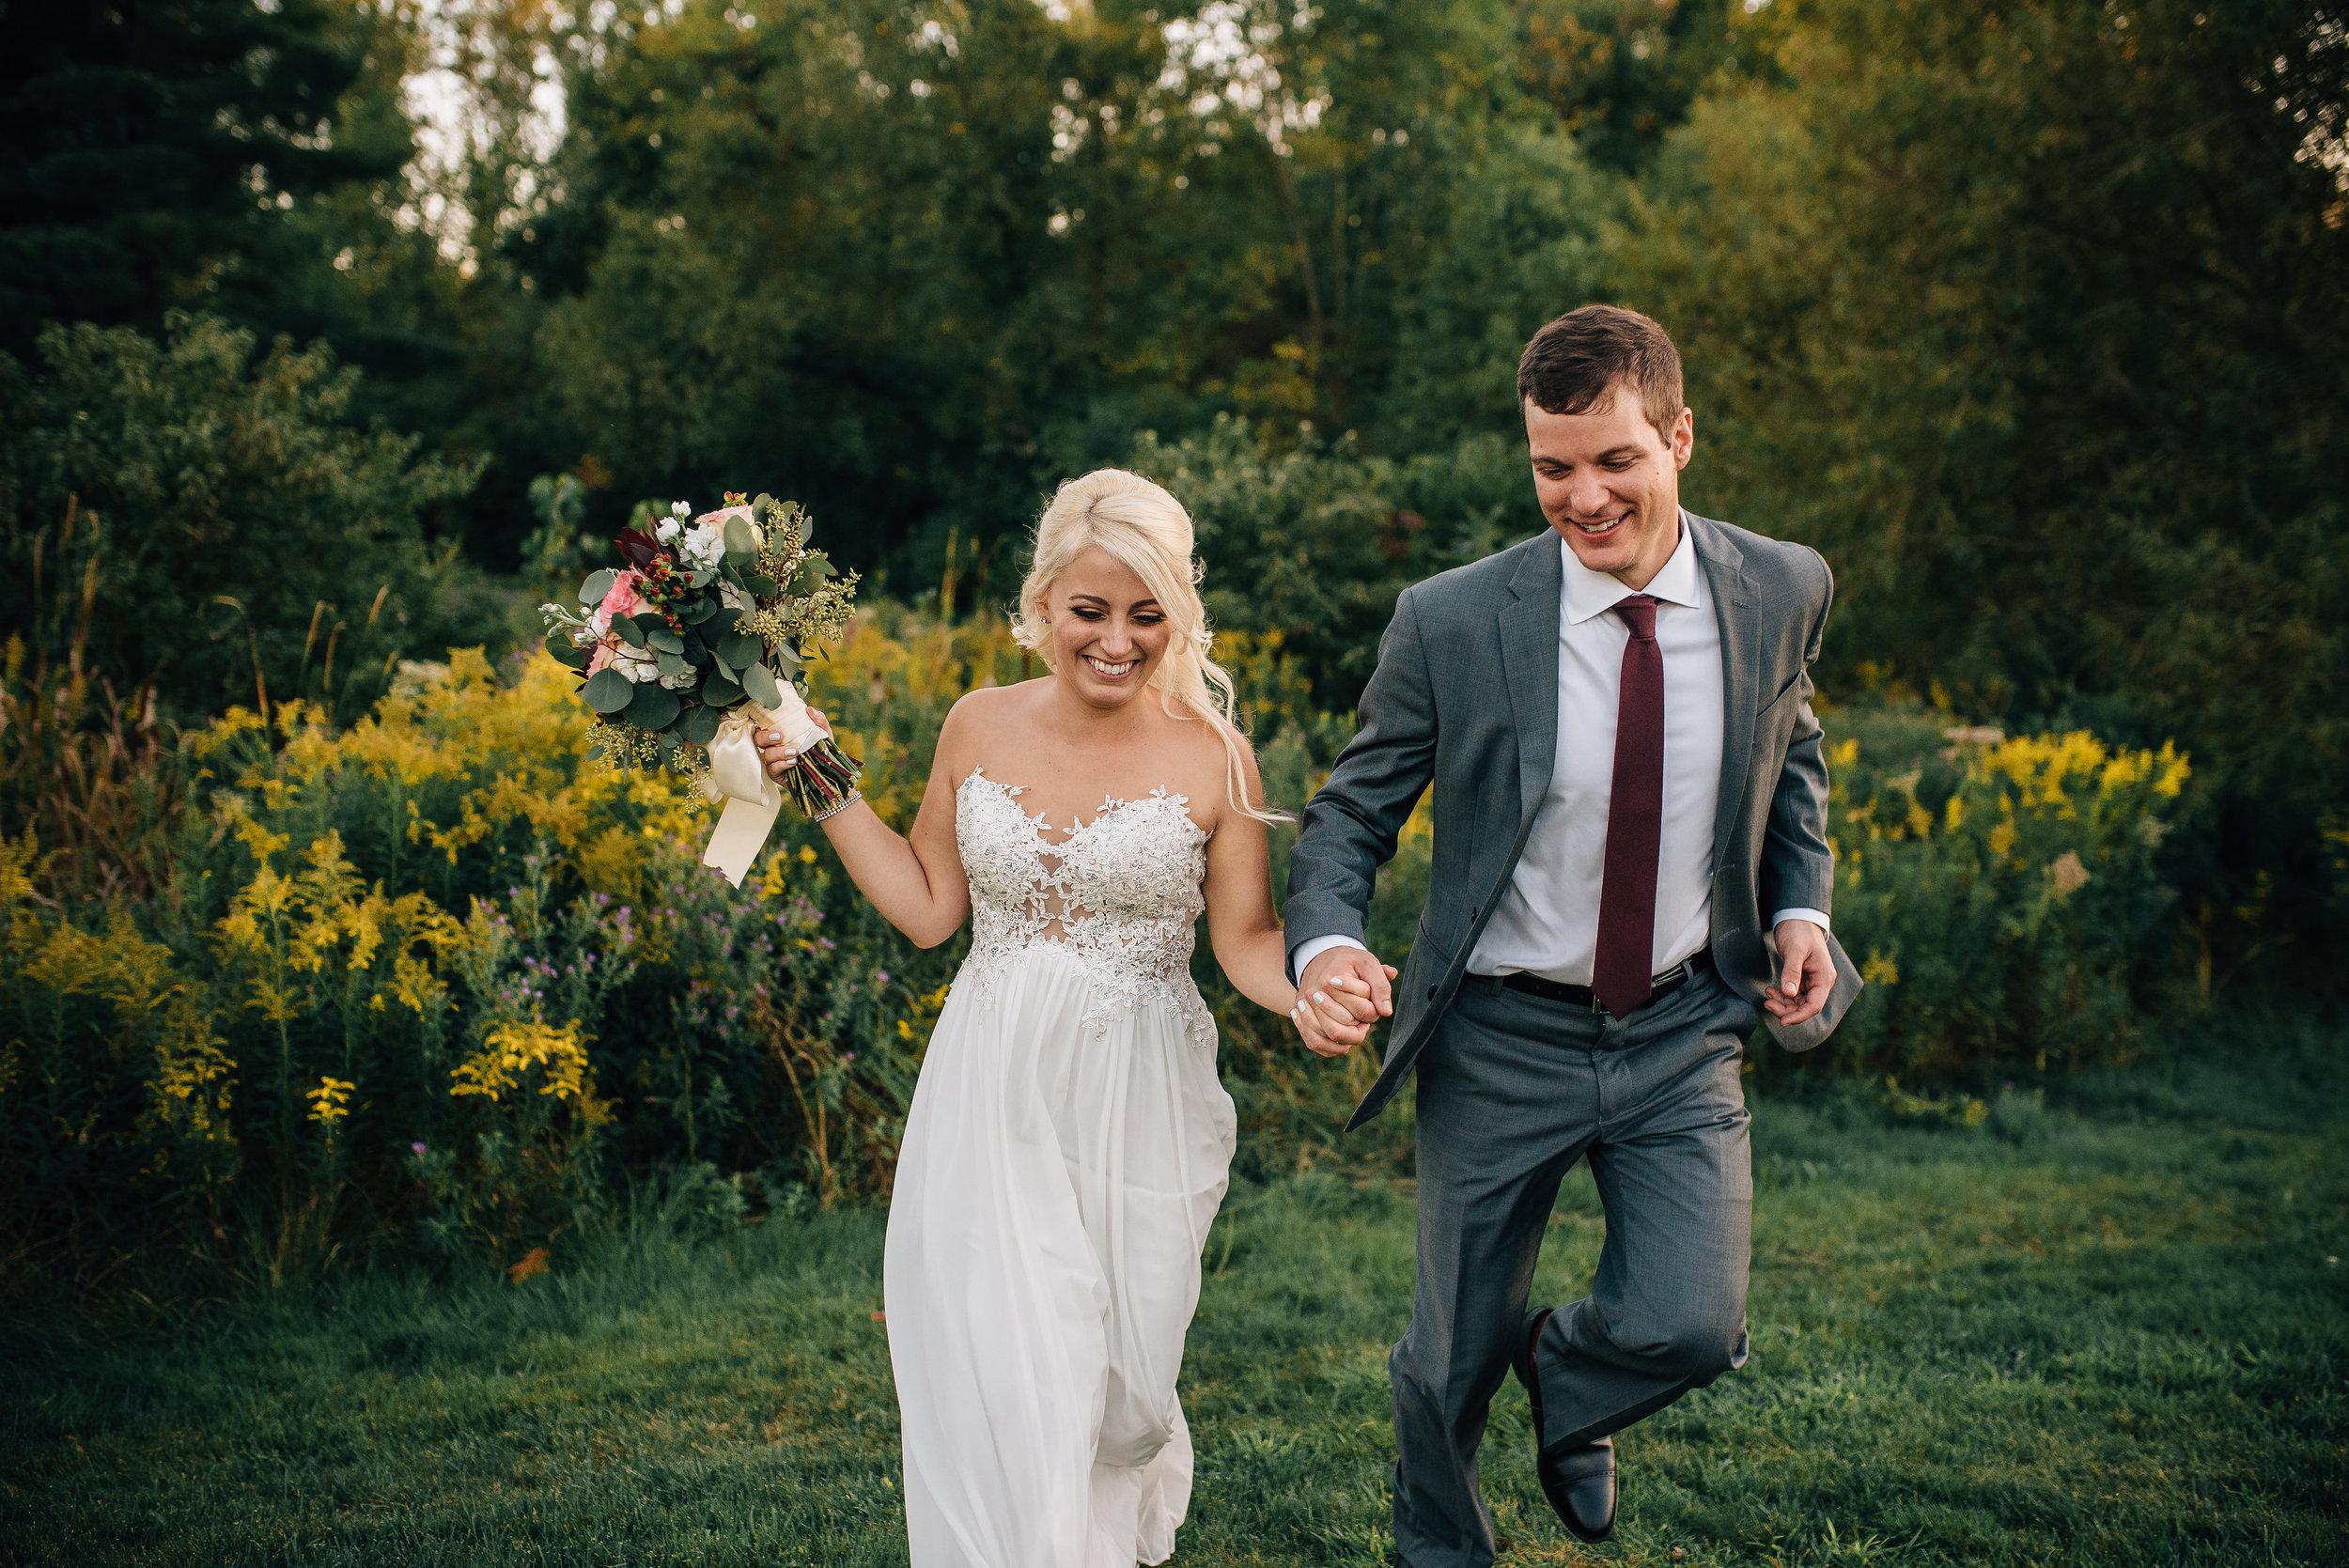 new york wedding photographer - north carolina wedding photographer - deerfield country club wedding